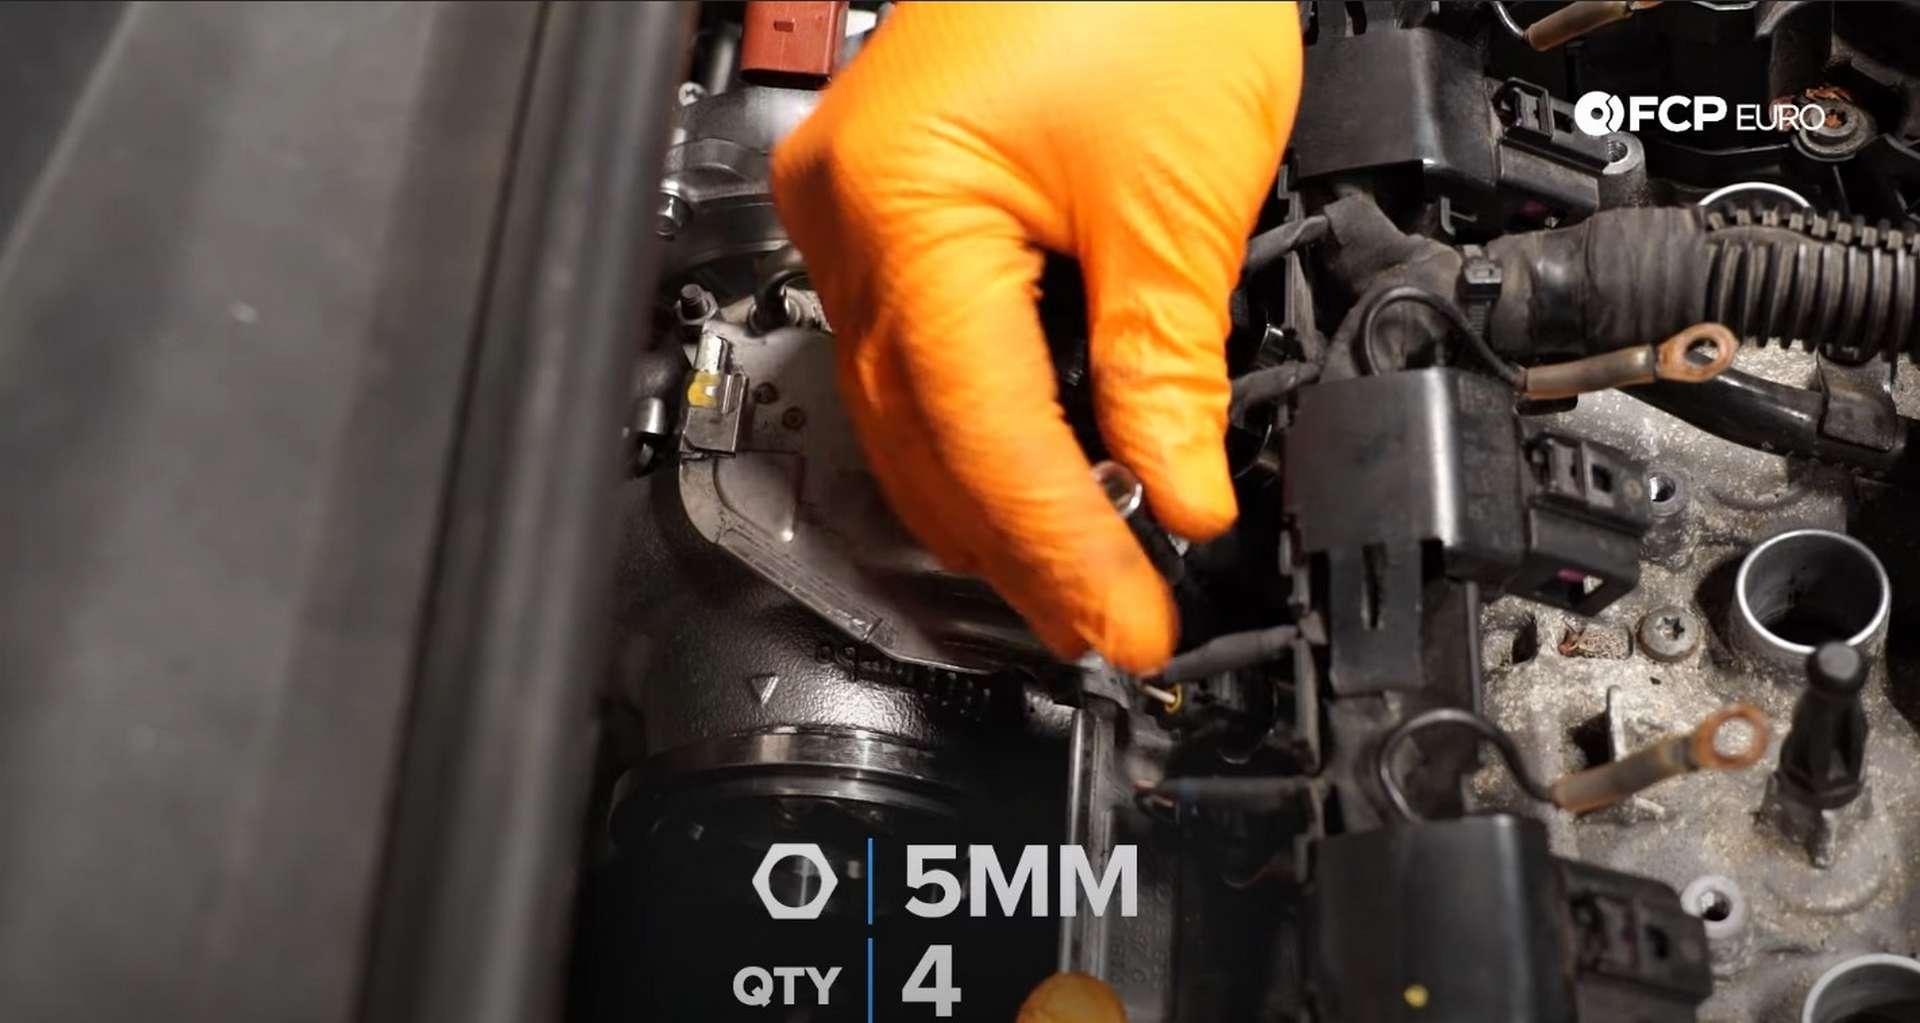 DIY MK7 VW GTI Turbocharger Upgrade installing the heat shield bolts